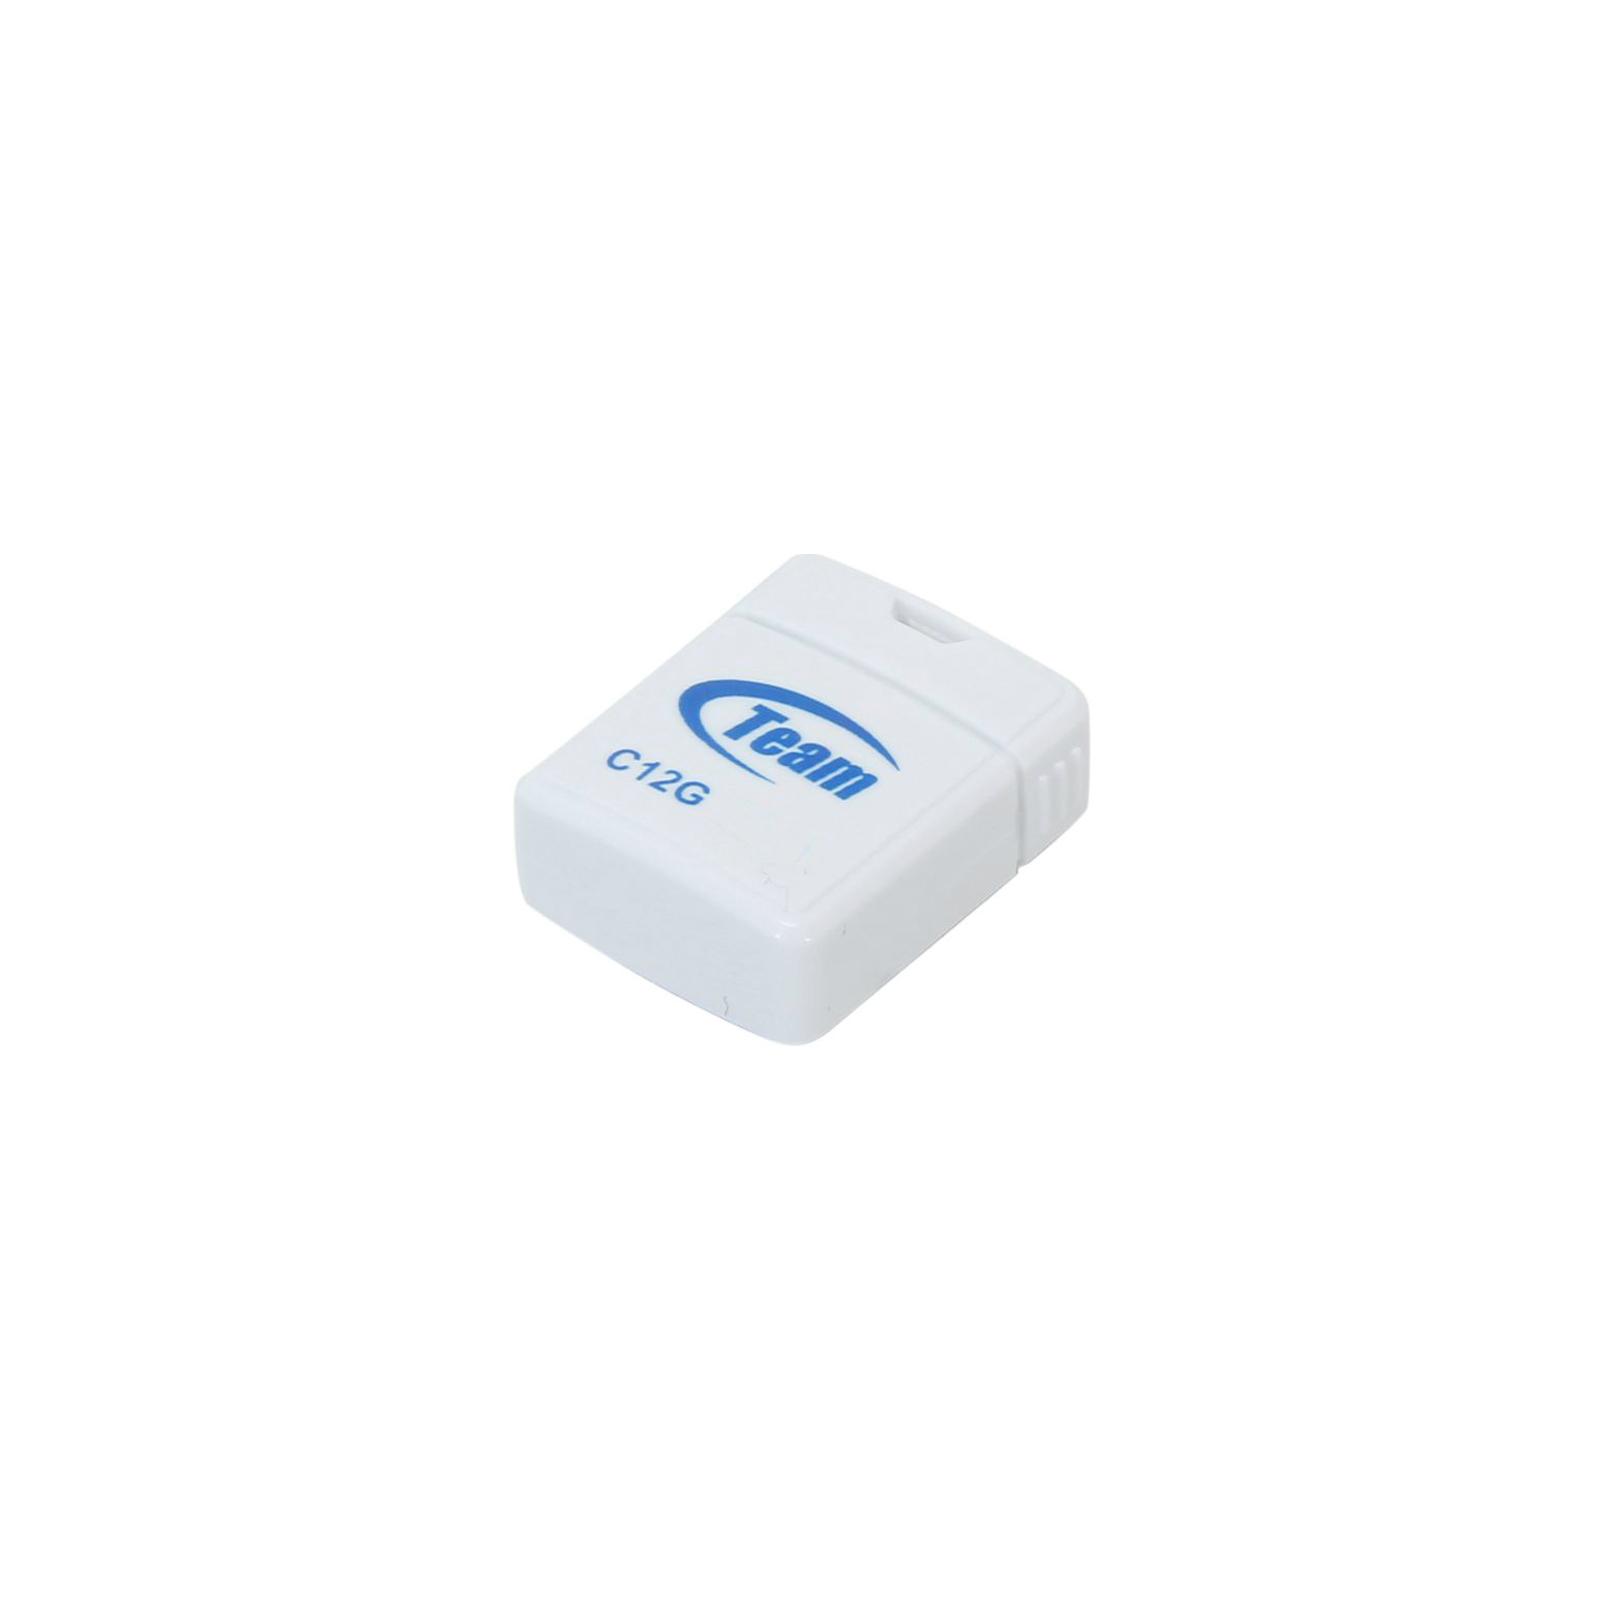 USB флеш накопитель Team 32GB C12G White USB 2.0 (TC12G32GW01) изображение 2